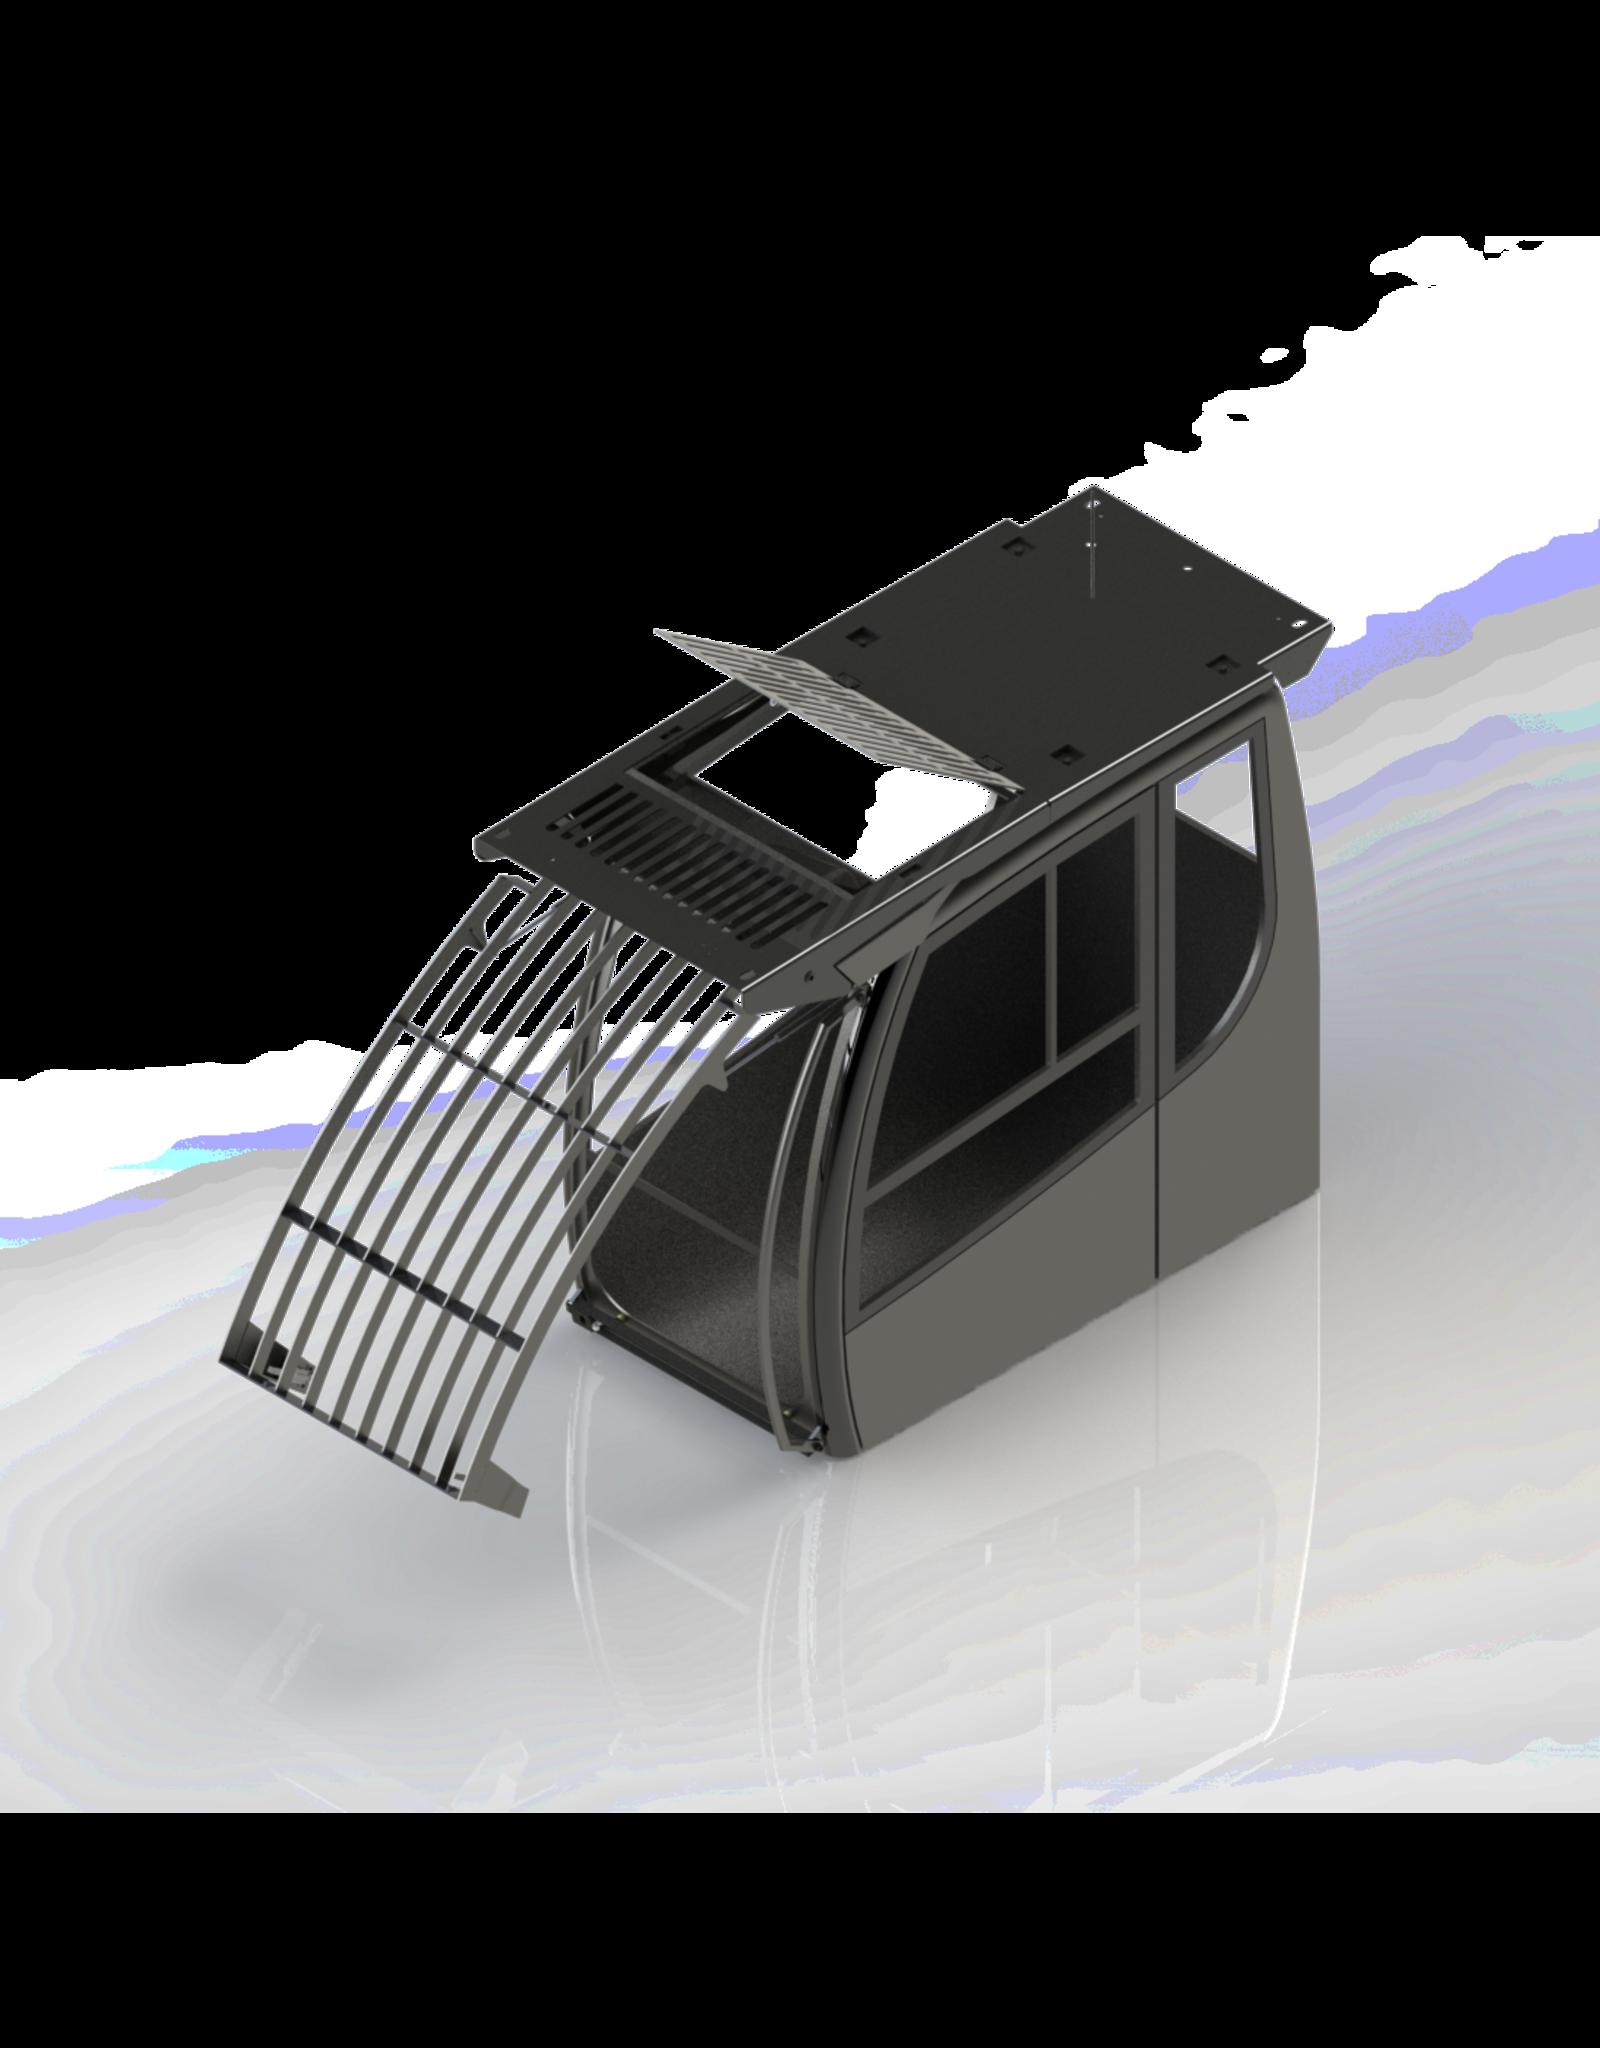 Echle Hartstahl GmbH FOPS for Komatsu PC210LC-10/11